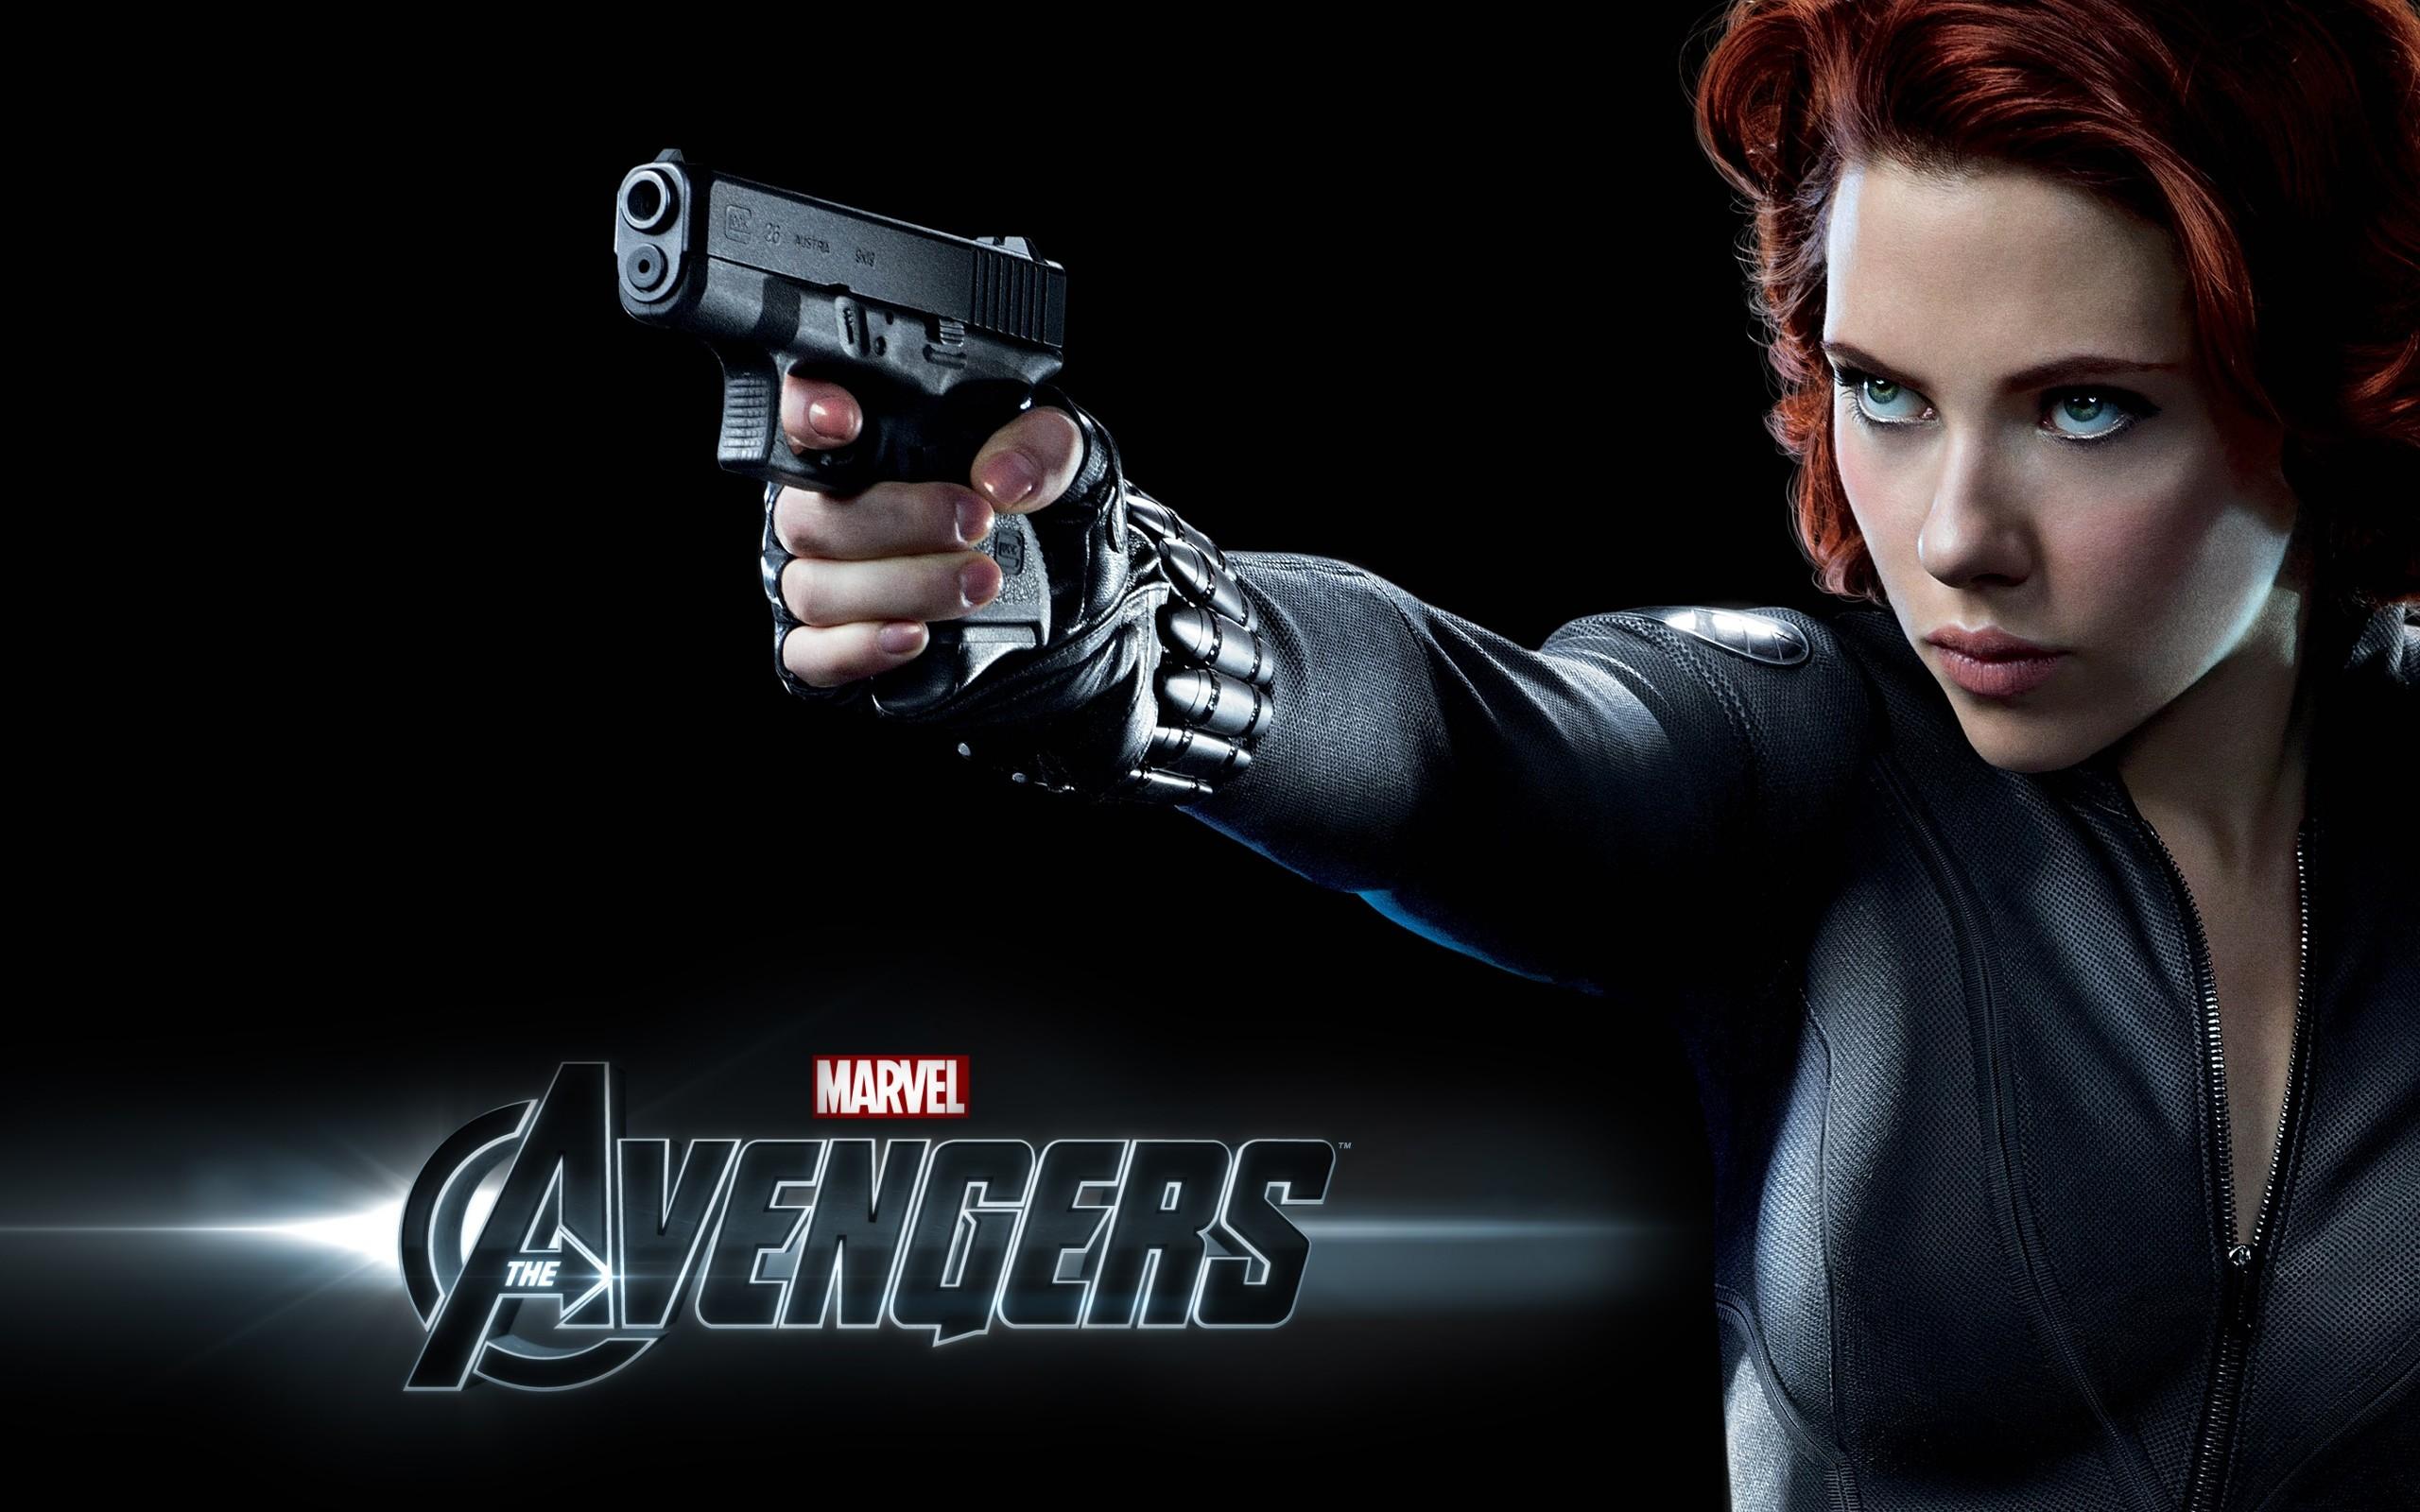 Scarlett Johansson in The Avengers HD Wallpapers, Desktop Images